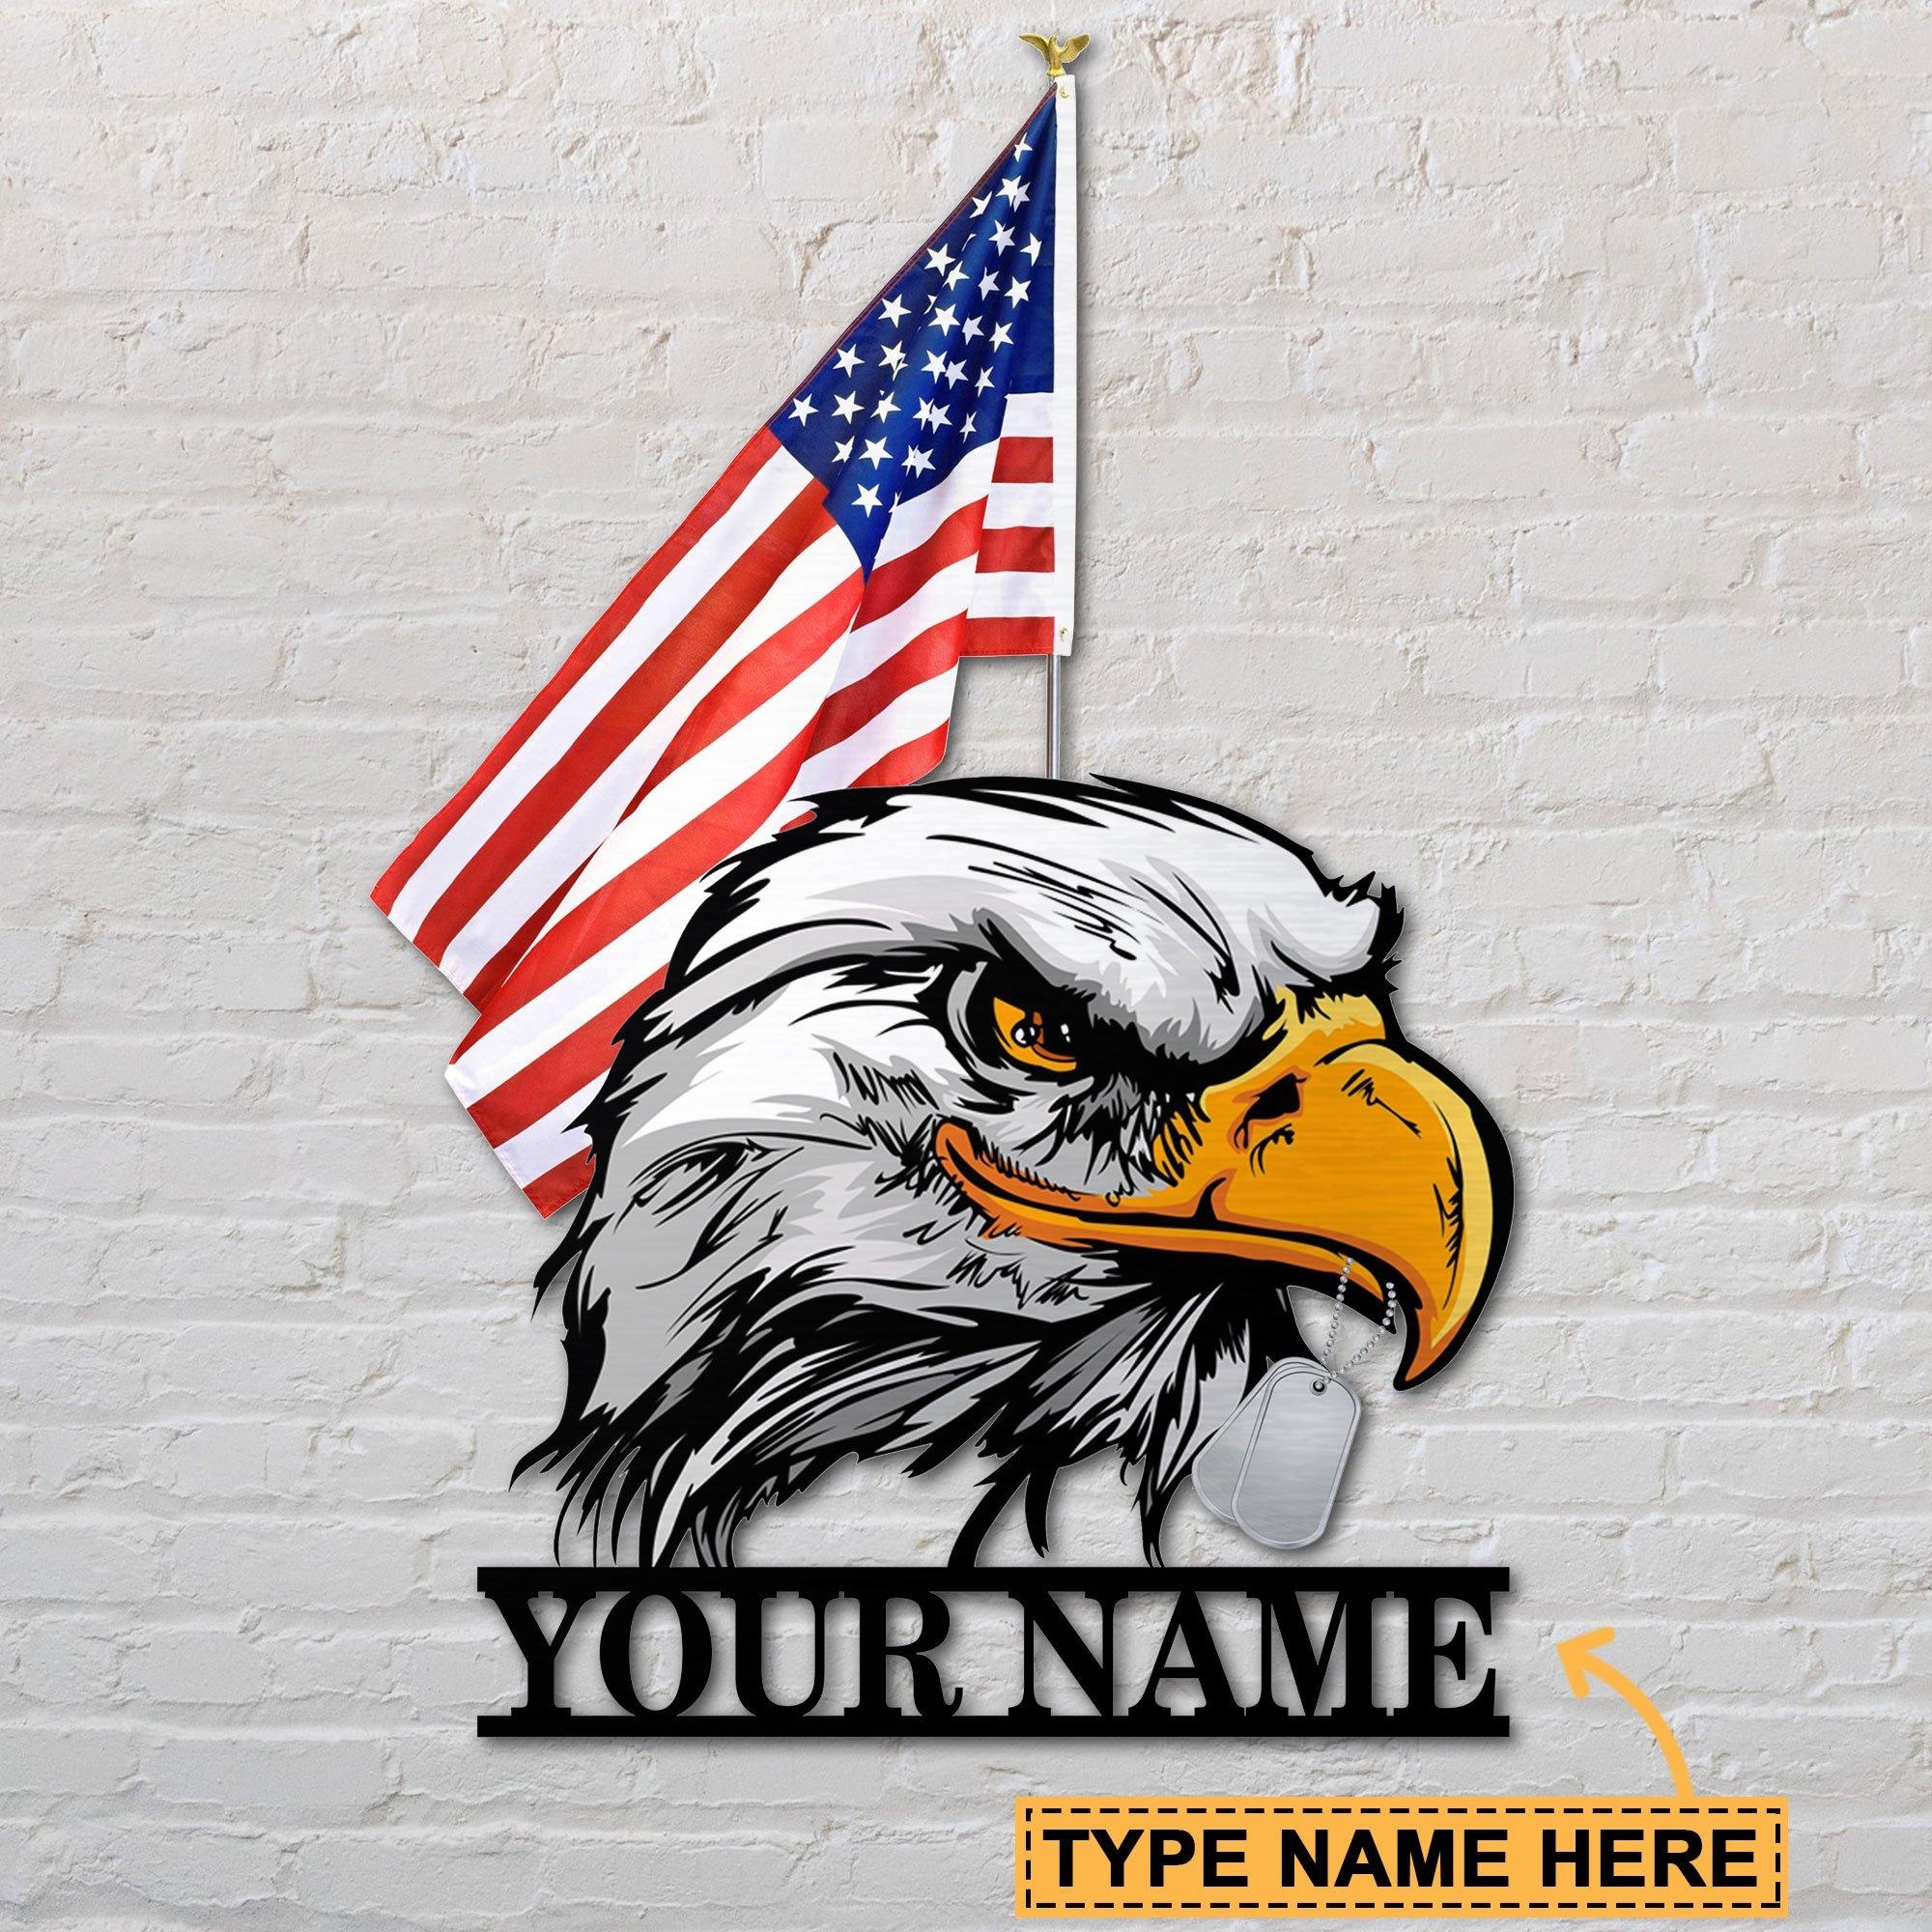 American flag eagle custom personalized metal sign 1